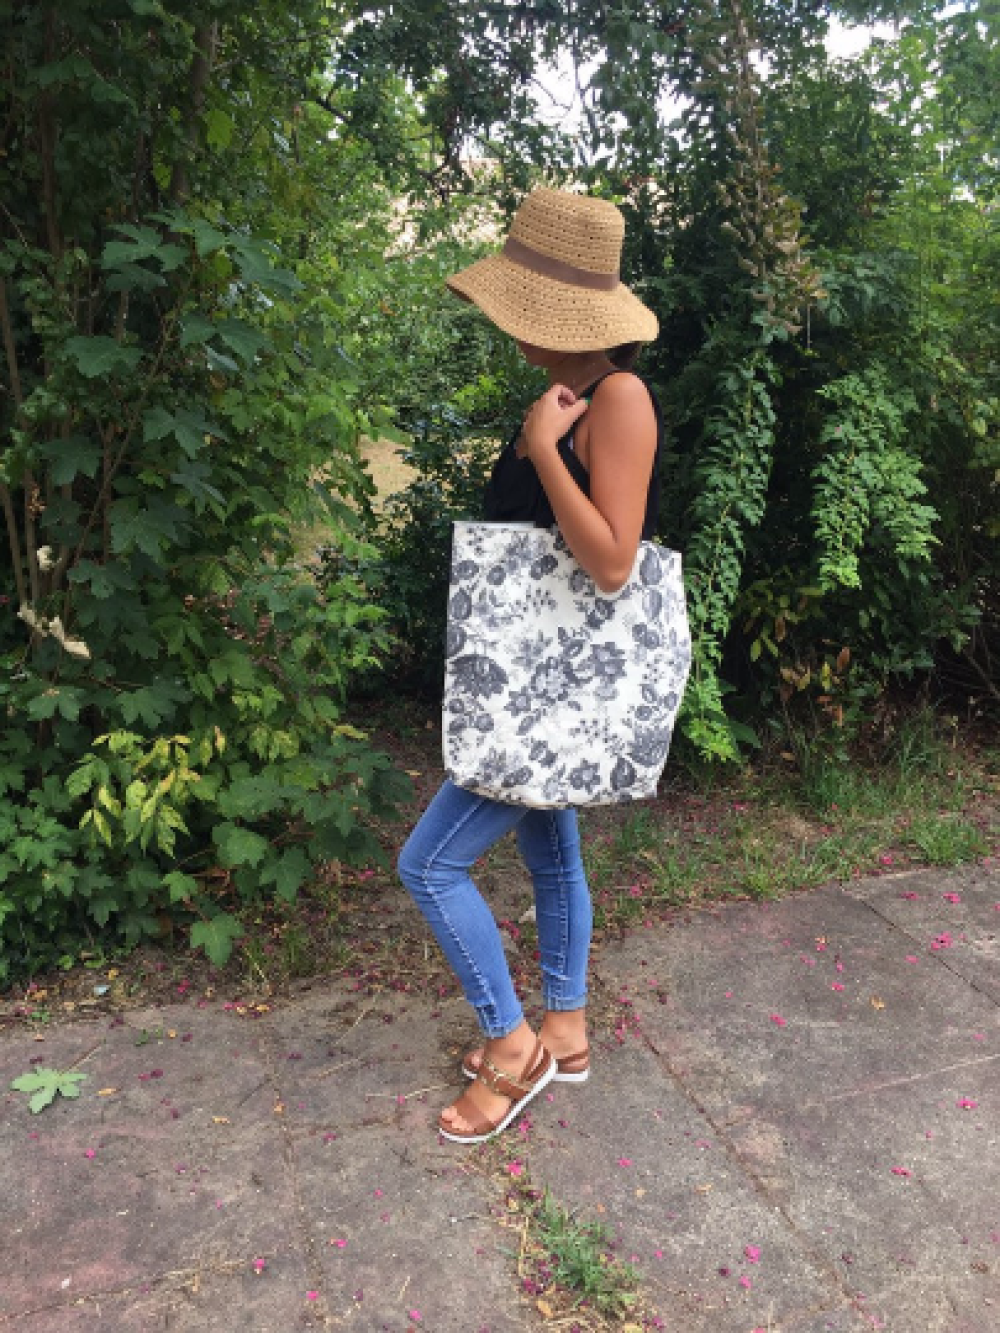 Sac cabas / tote bag / grand sac a main/ sac a main / grand sac / sac avec motif fleurs gris